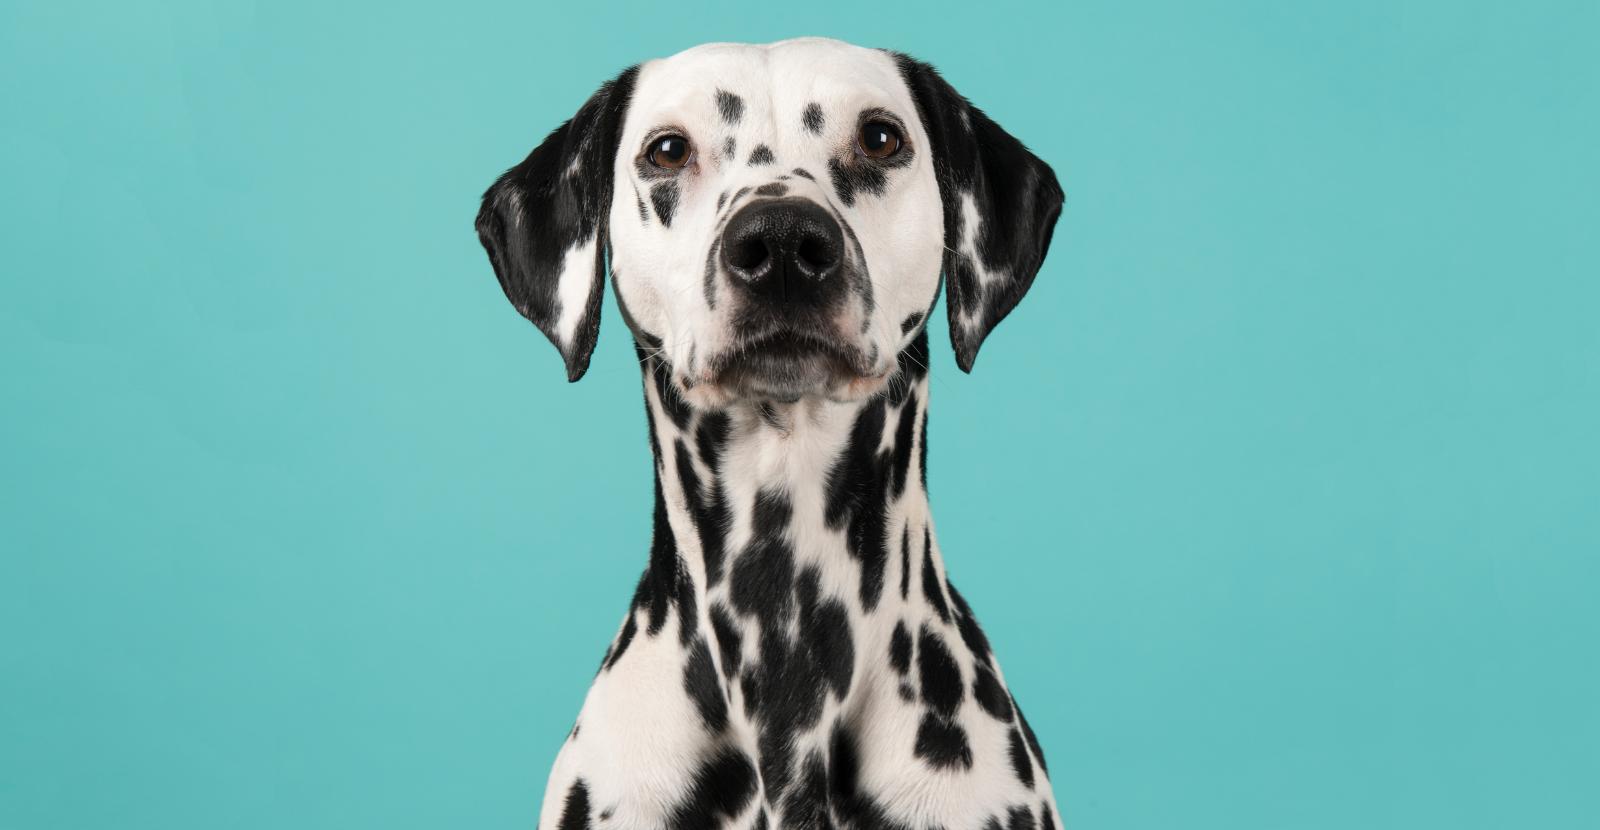 Dalmatians are Smart, Agile & Outgoing Fire Dogs